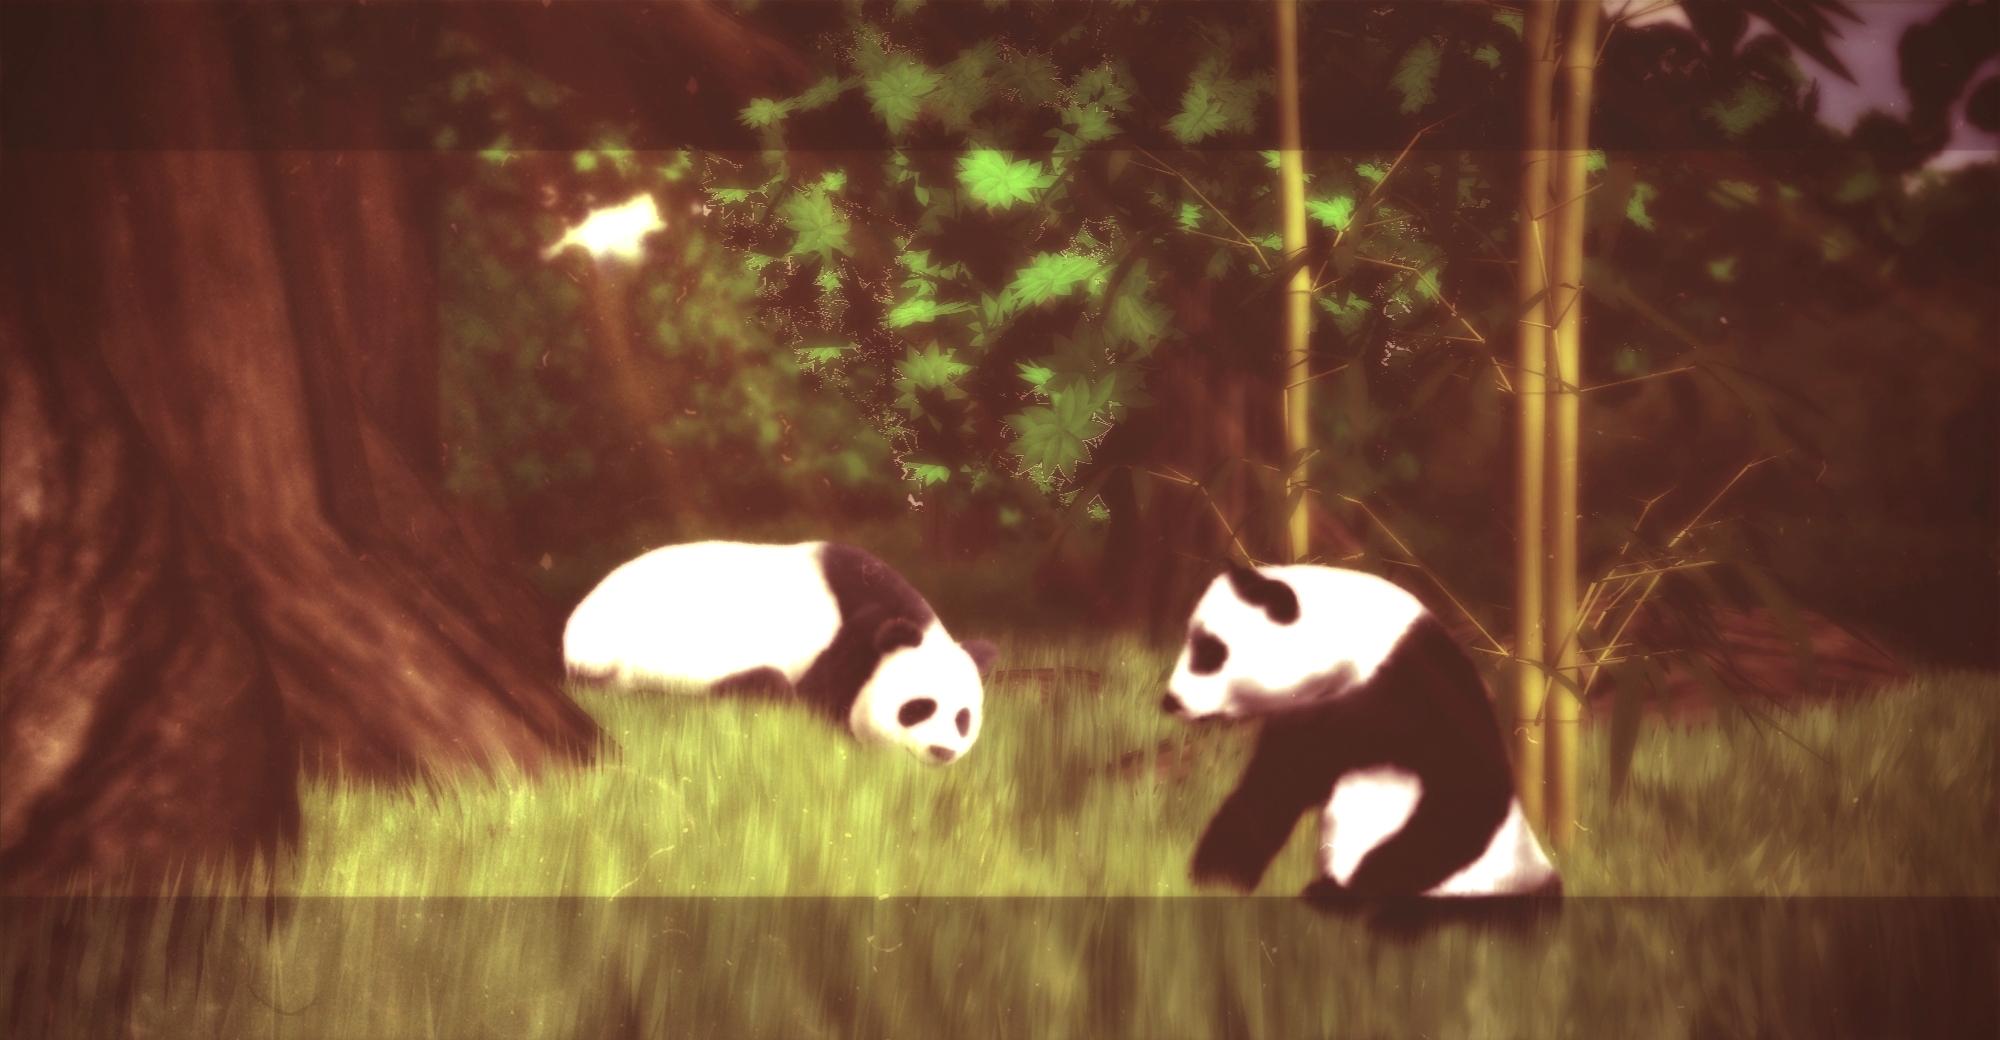 Feel the nature [7] by Nessa-sama